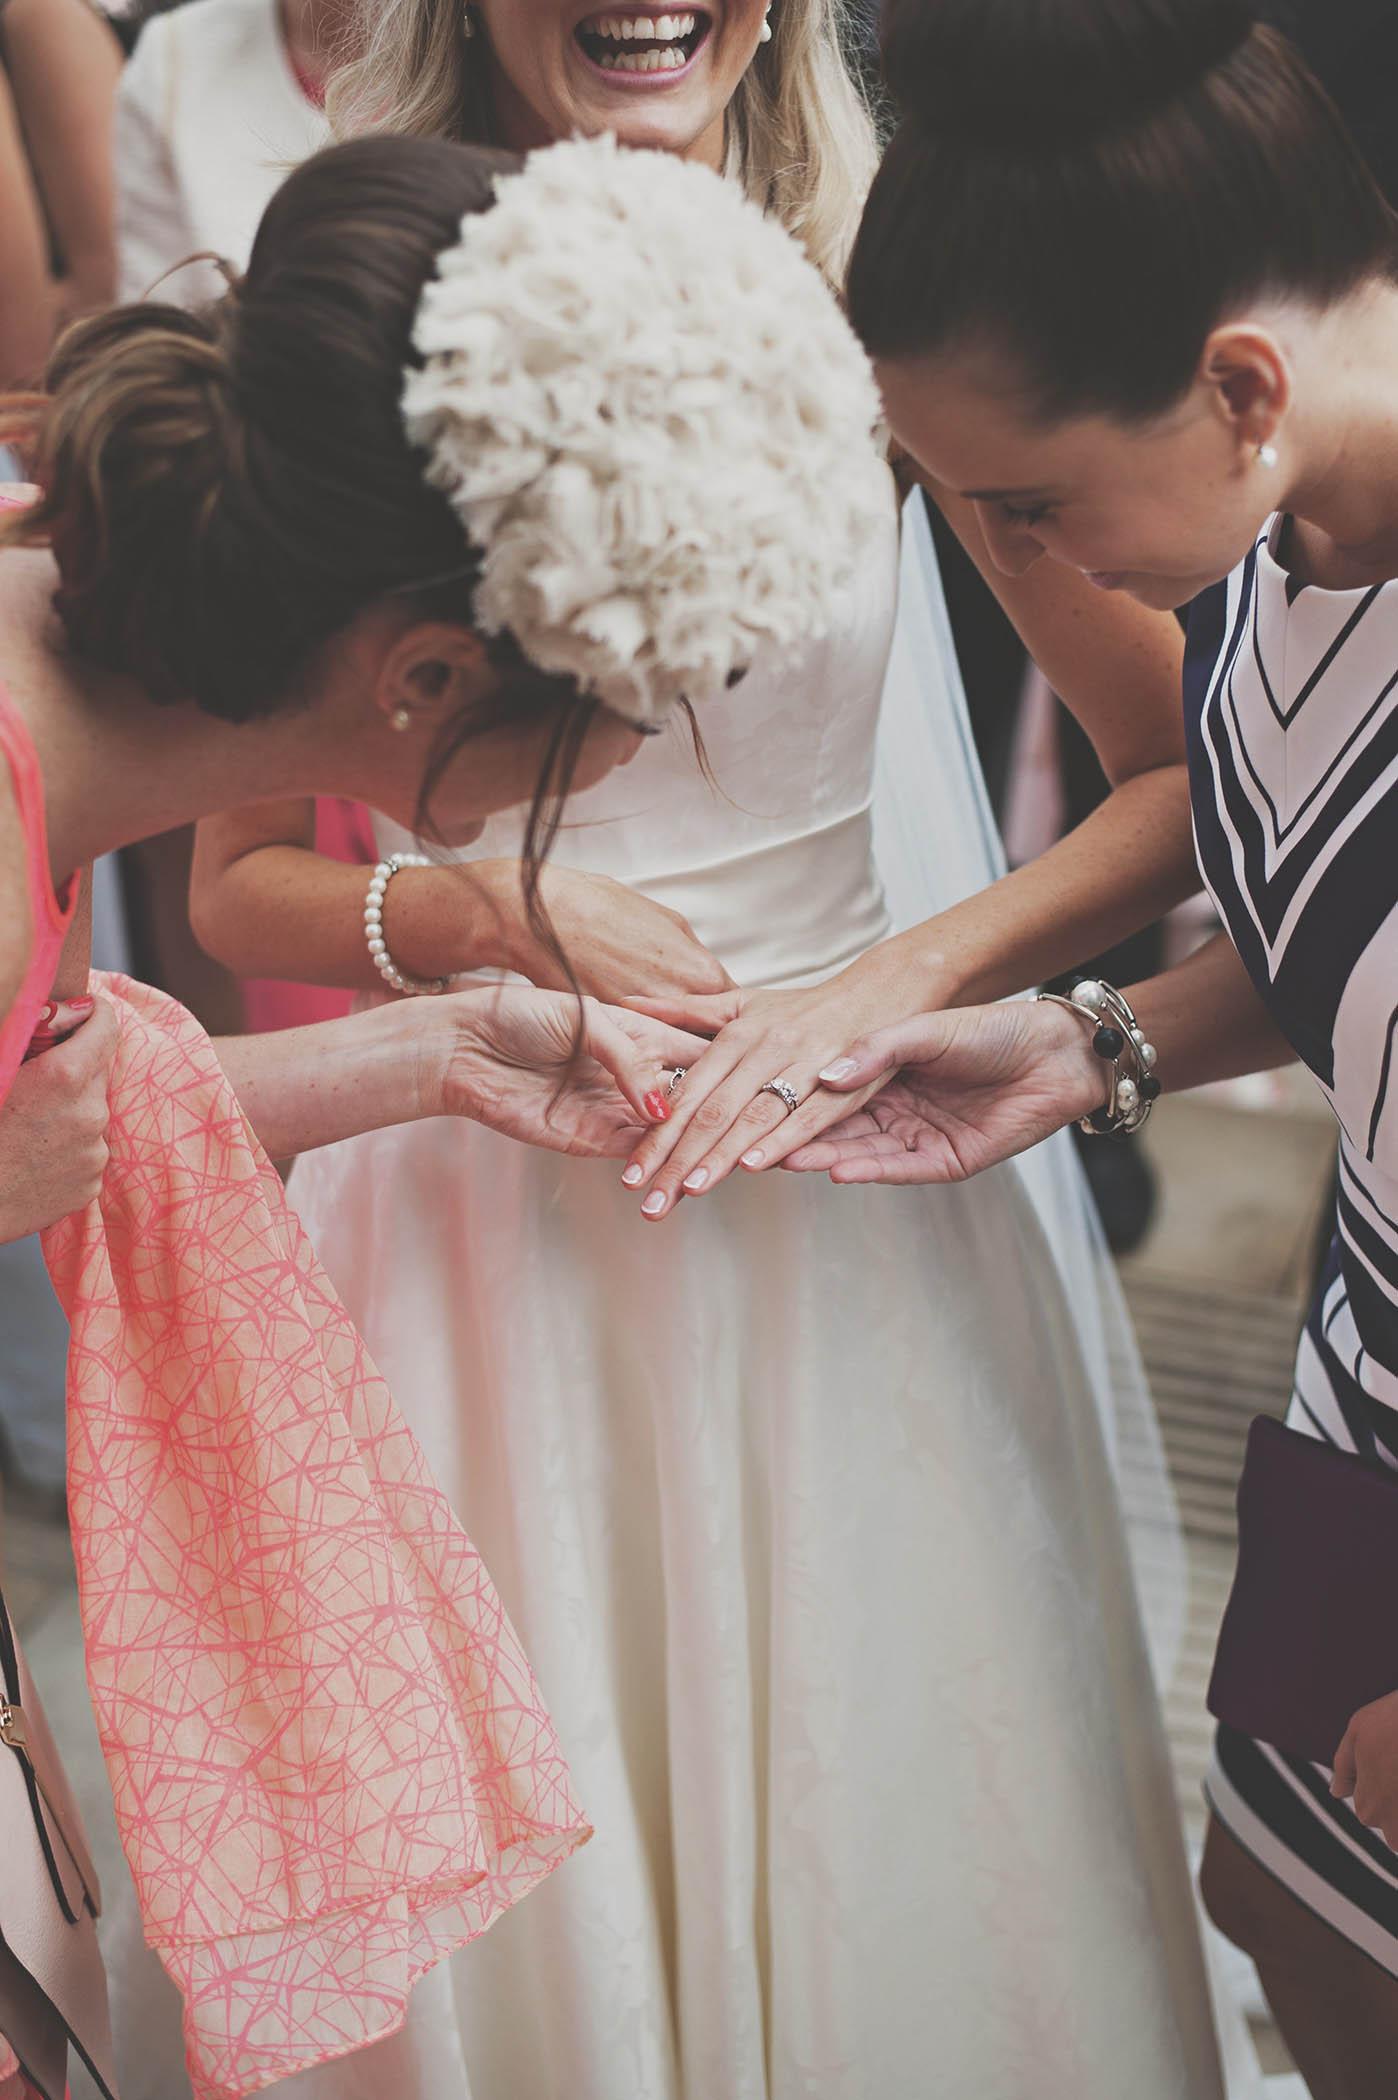 Lough Rynn Castle wedding, guests admire bride's wedding ring